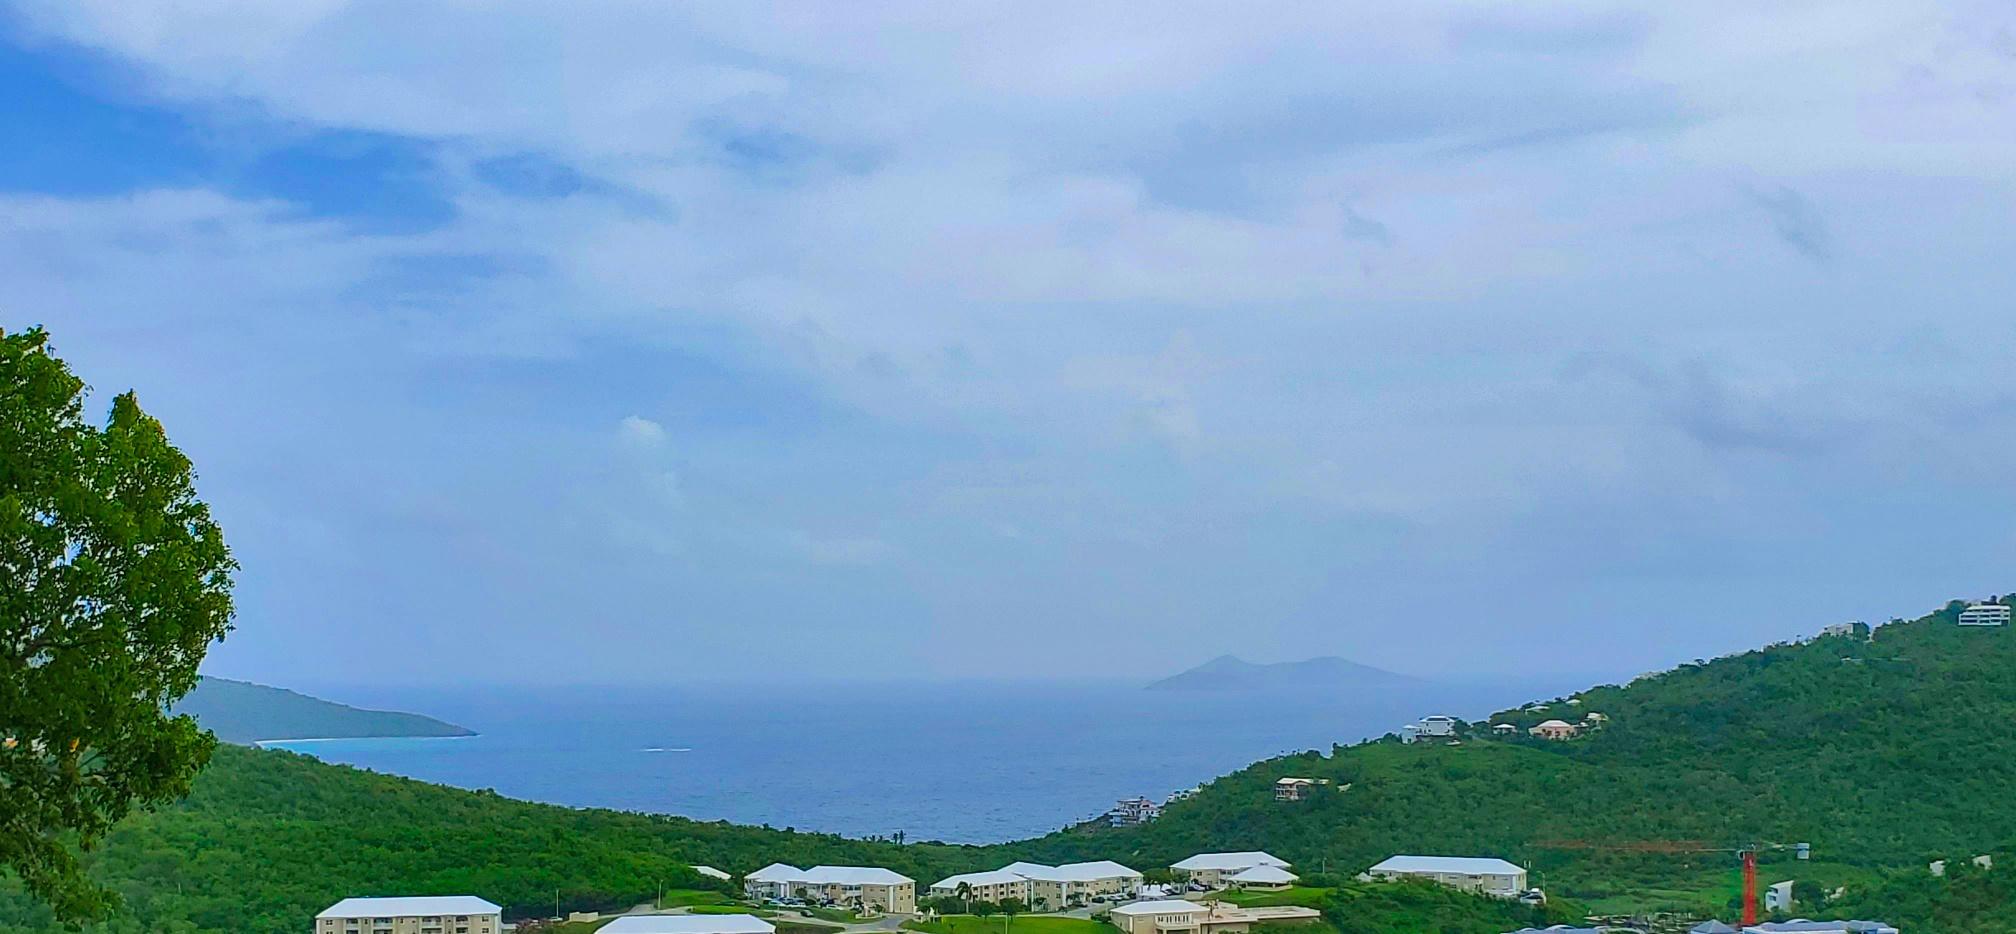 RE/MAX real estate, US Virgin Islands, St. Quaco & Zimmerman, Status Change  Res Rental  St. Joseph  Rosendahl GNS